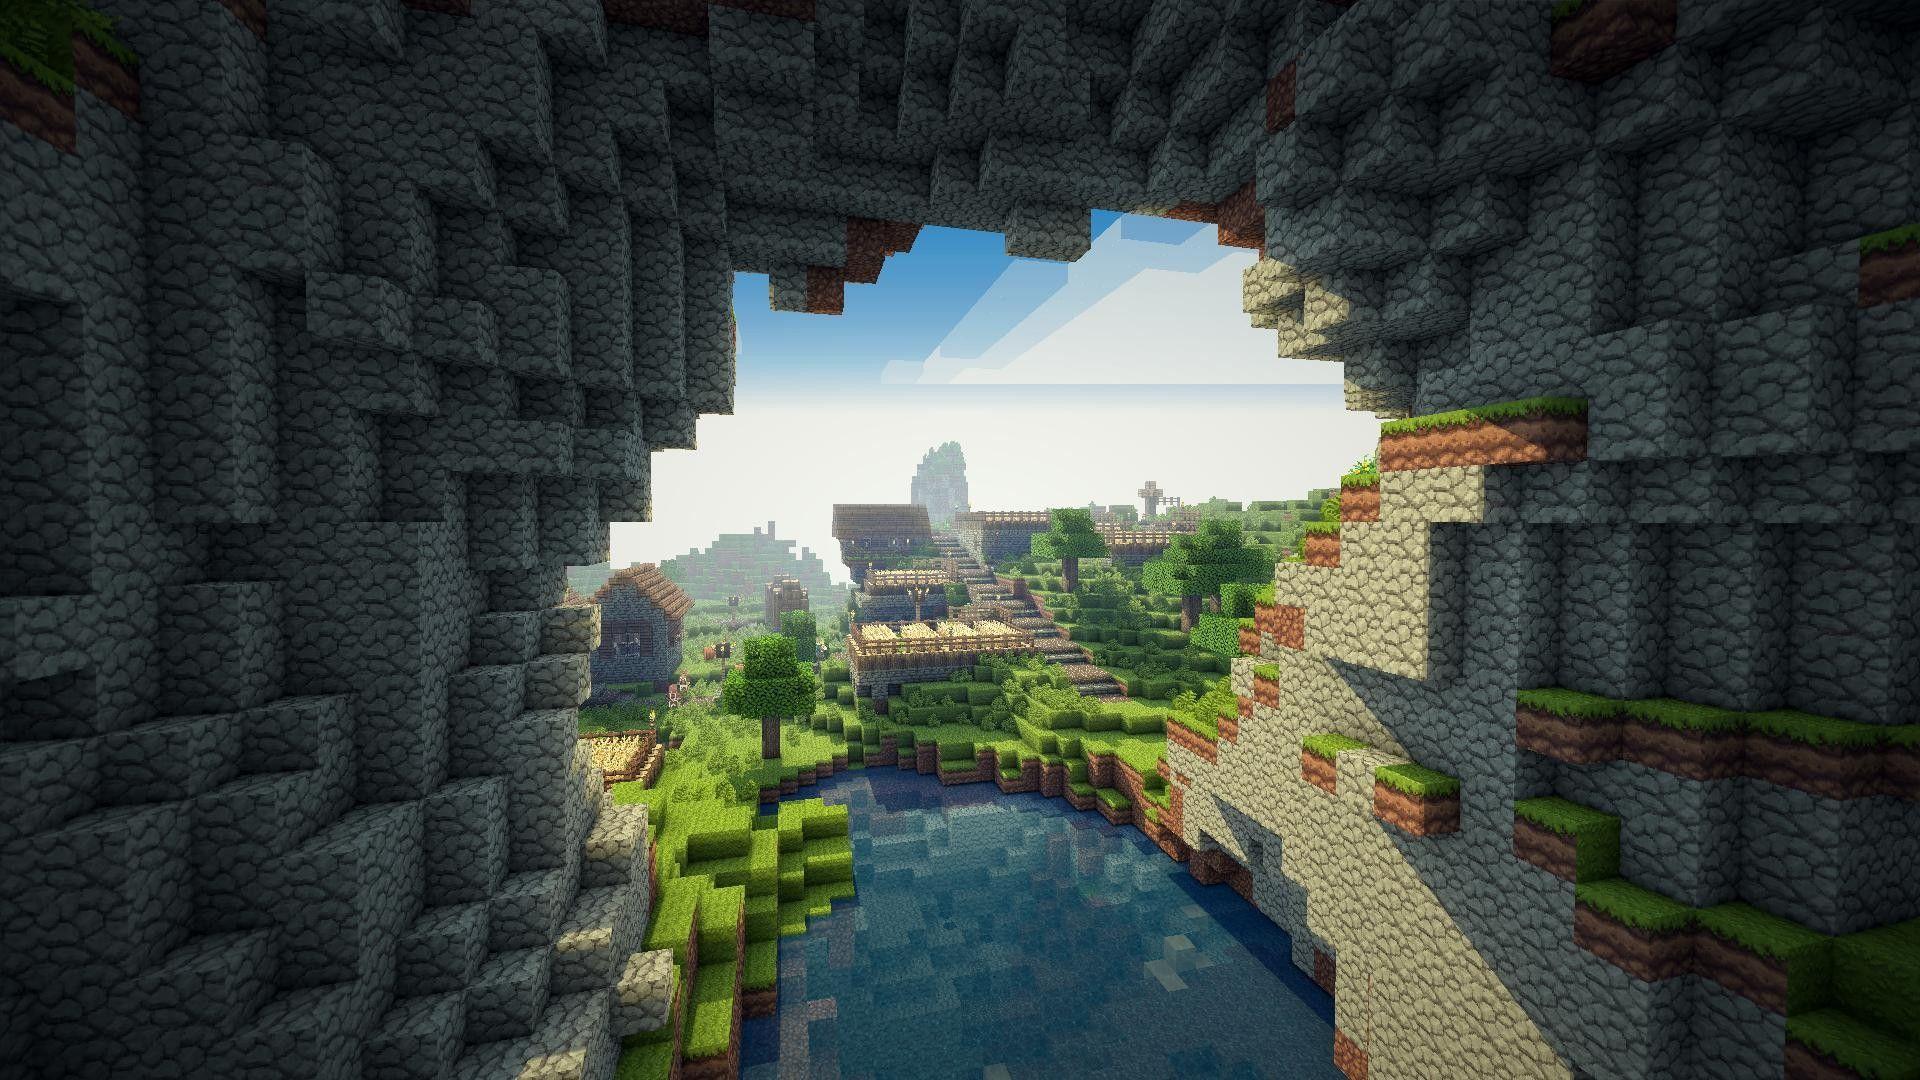 Most Inspiring Wallpaper Minecraft Real Life - 74119510804c1bfb3f52c9167d4543cc  Pic_92806.jpg